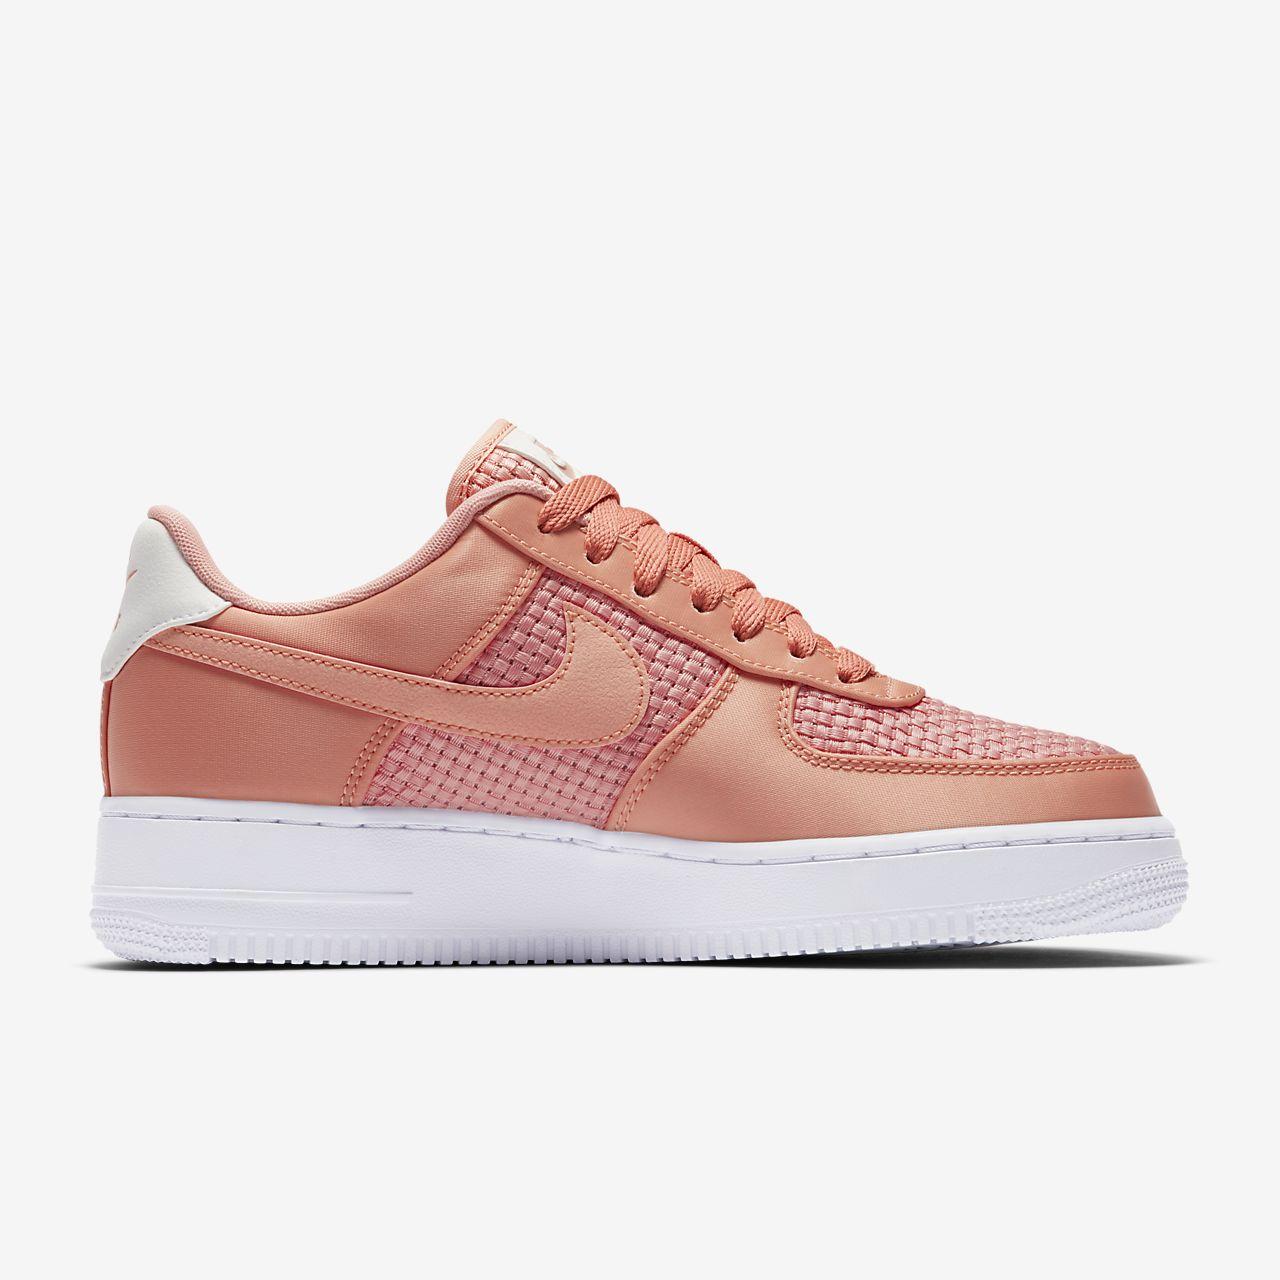 Chaussures Pource V7gf4q Vente On Air Nike Corail 1 Femmes qZCvO0wFE